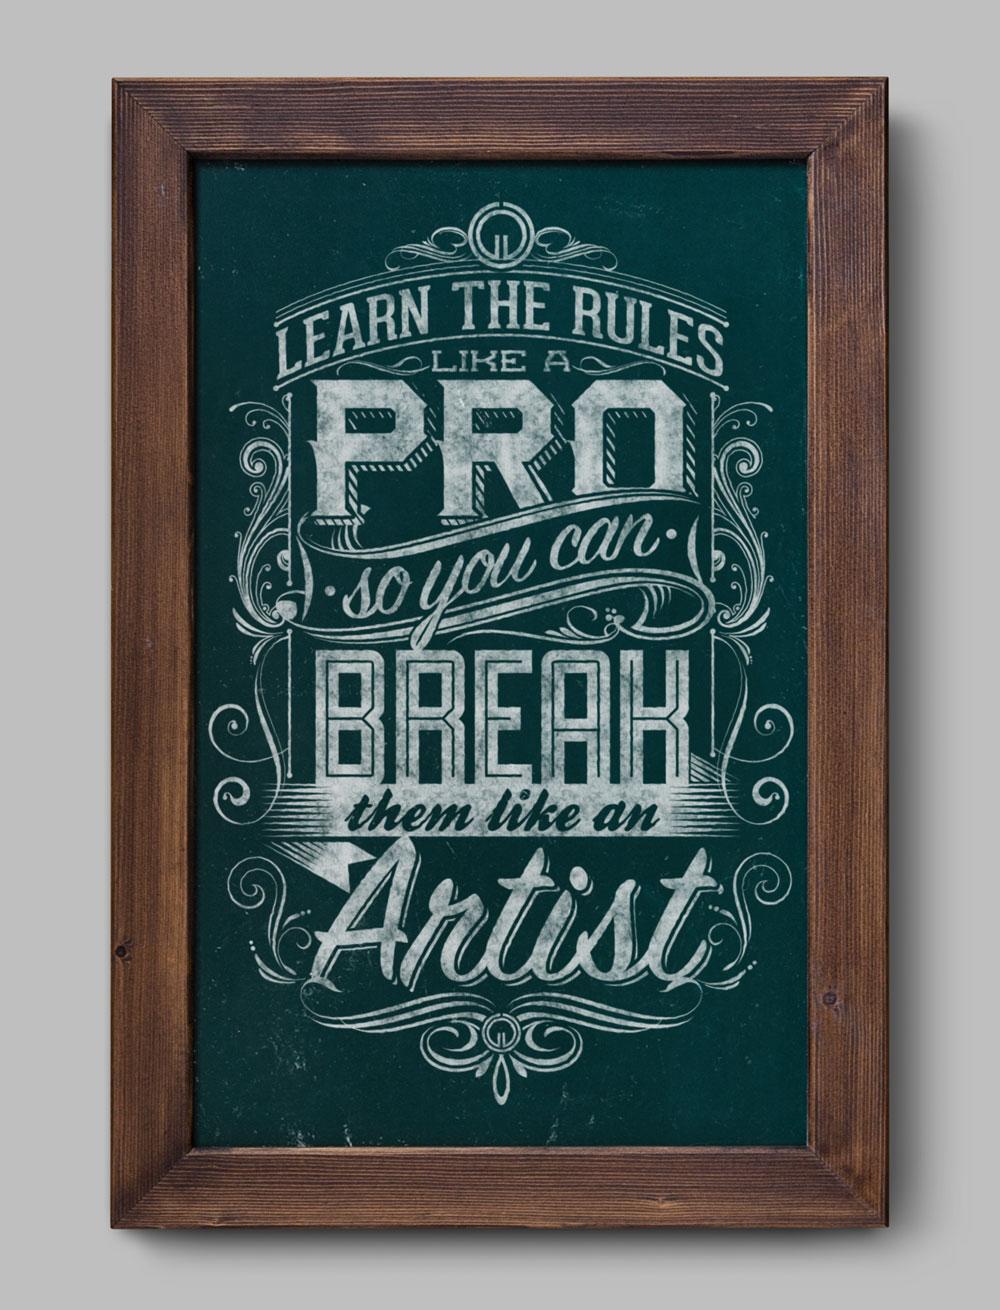 Learn-the-rules-chalkboard-mockup